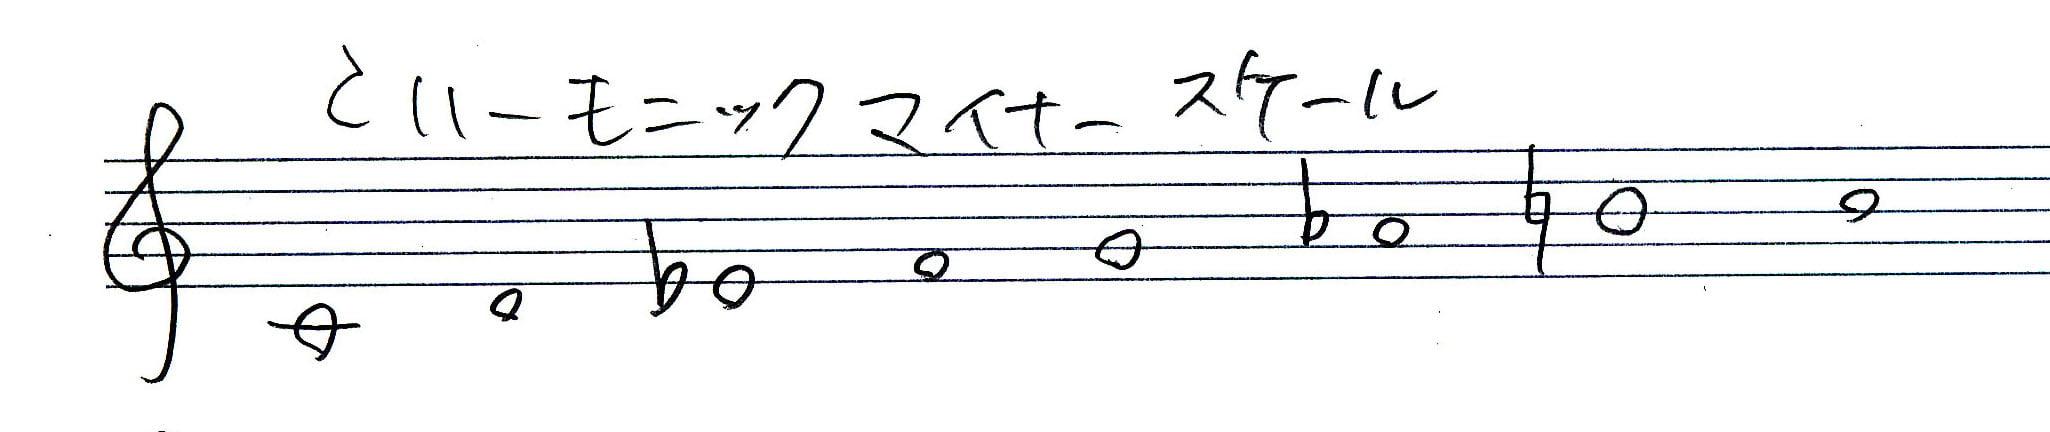 c-harmonic-minor